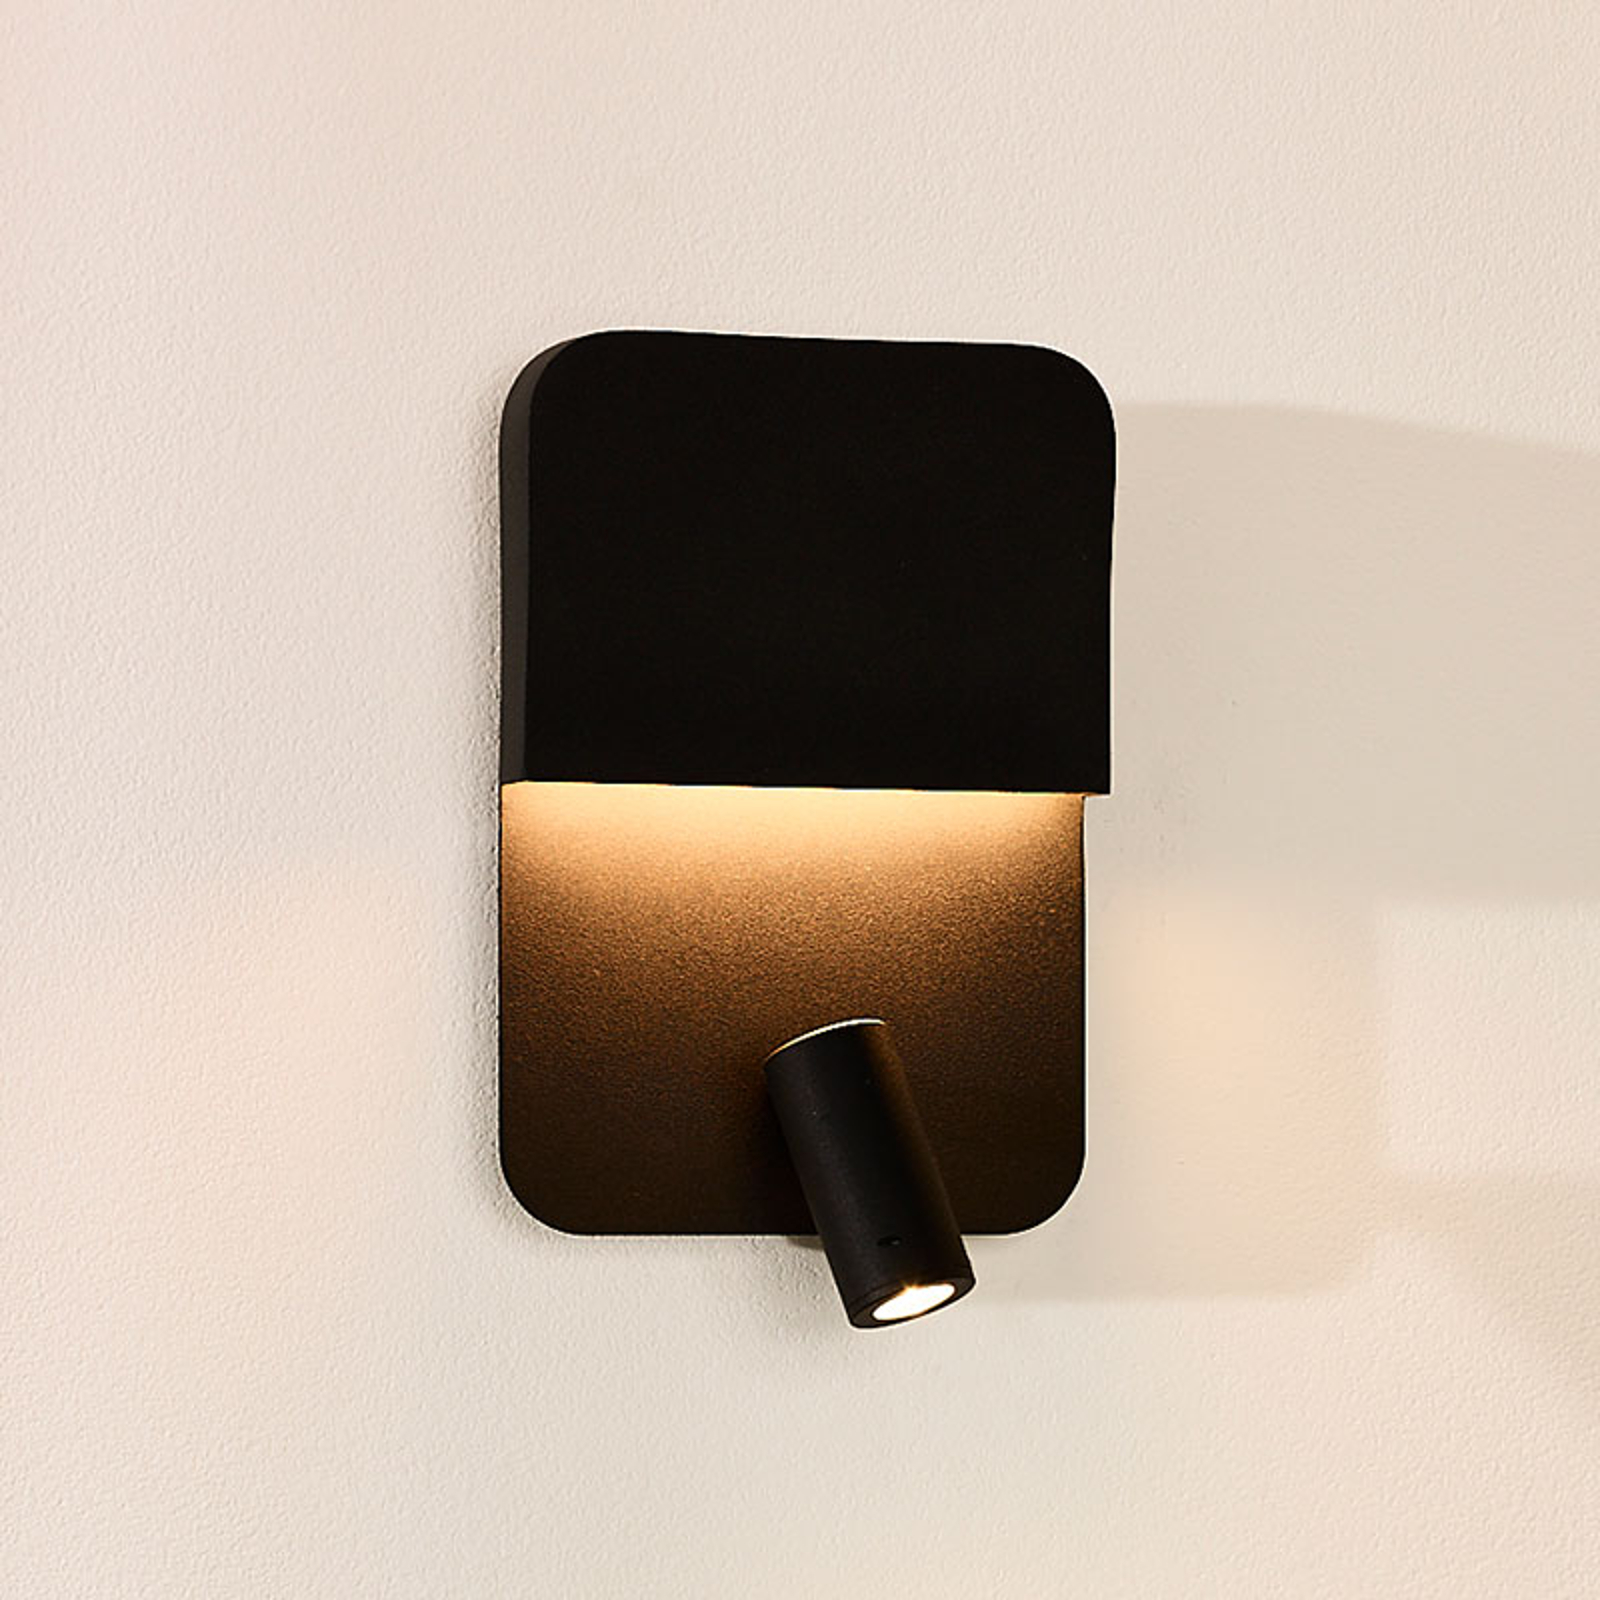 LED wandlamp Boxer met spot, zwart